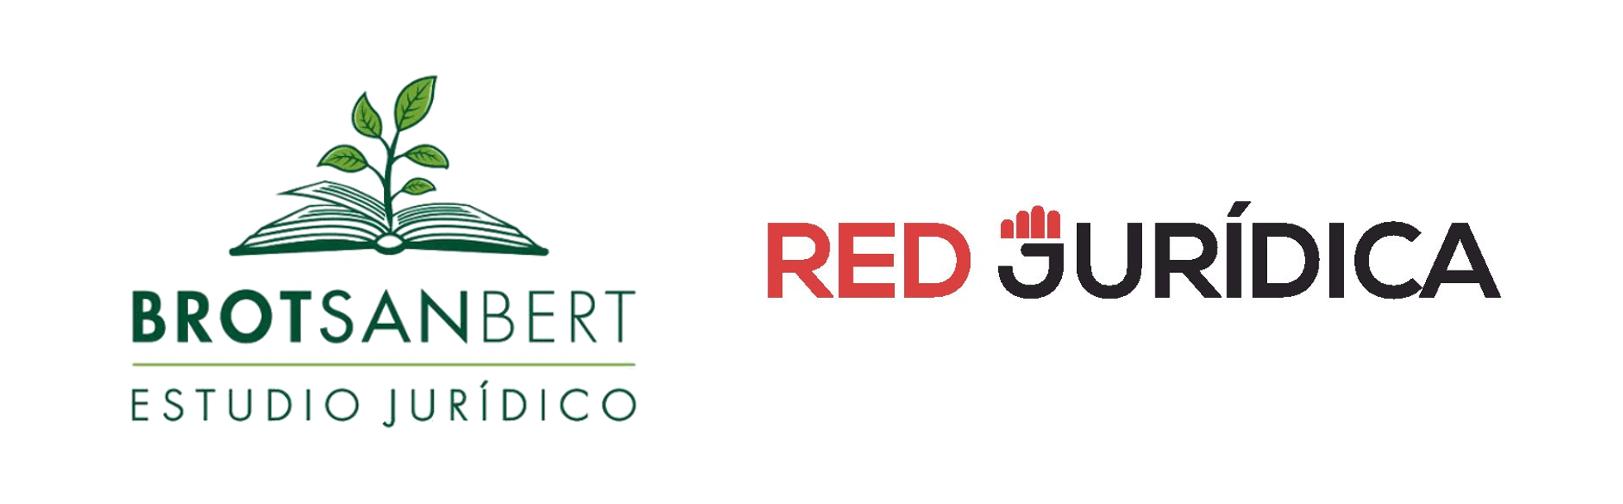 Logos RJ y Brotsanbert